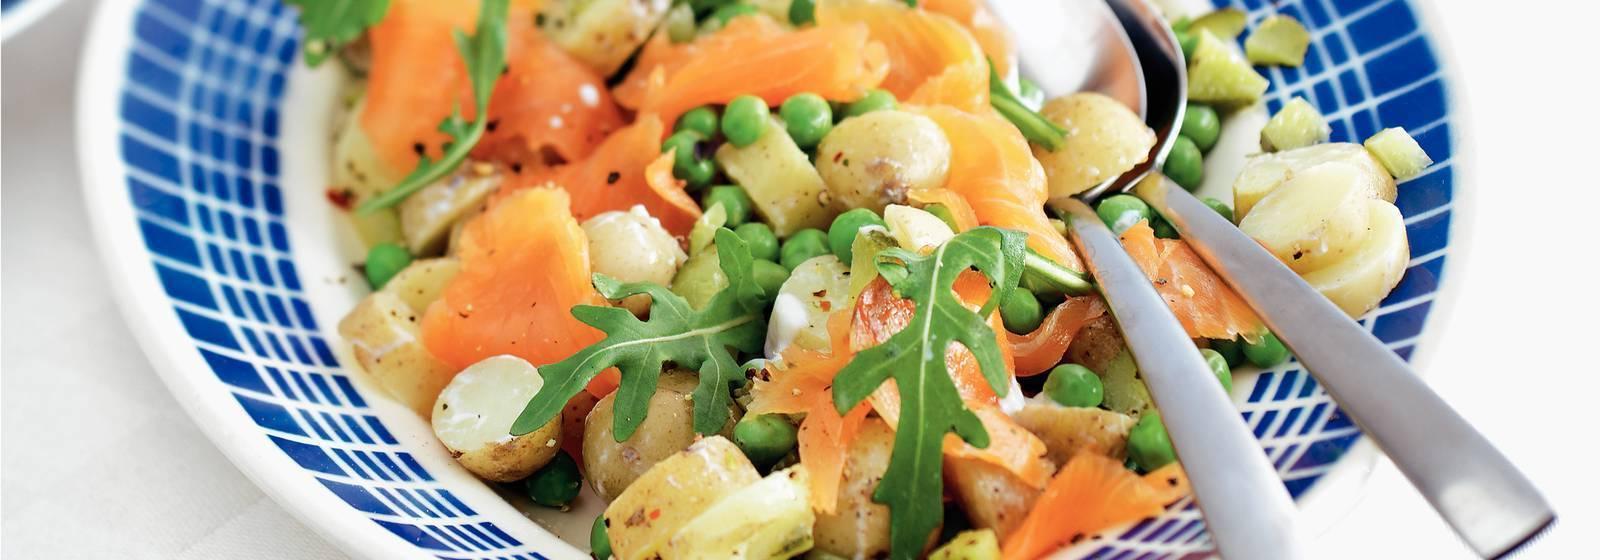 Lukewarm potato salad with smoked salmon